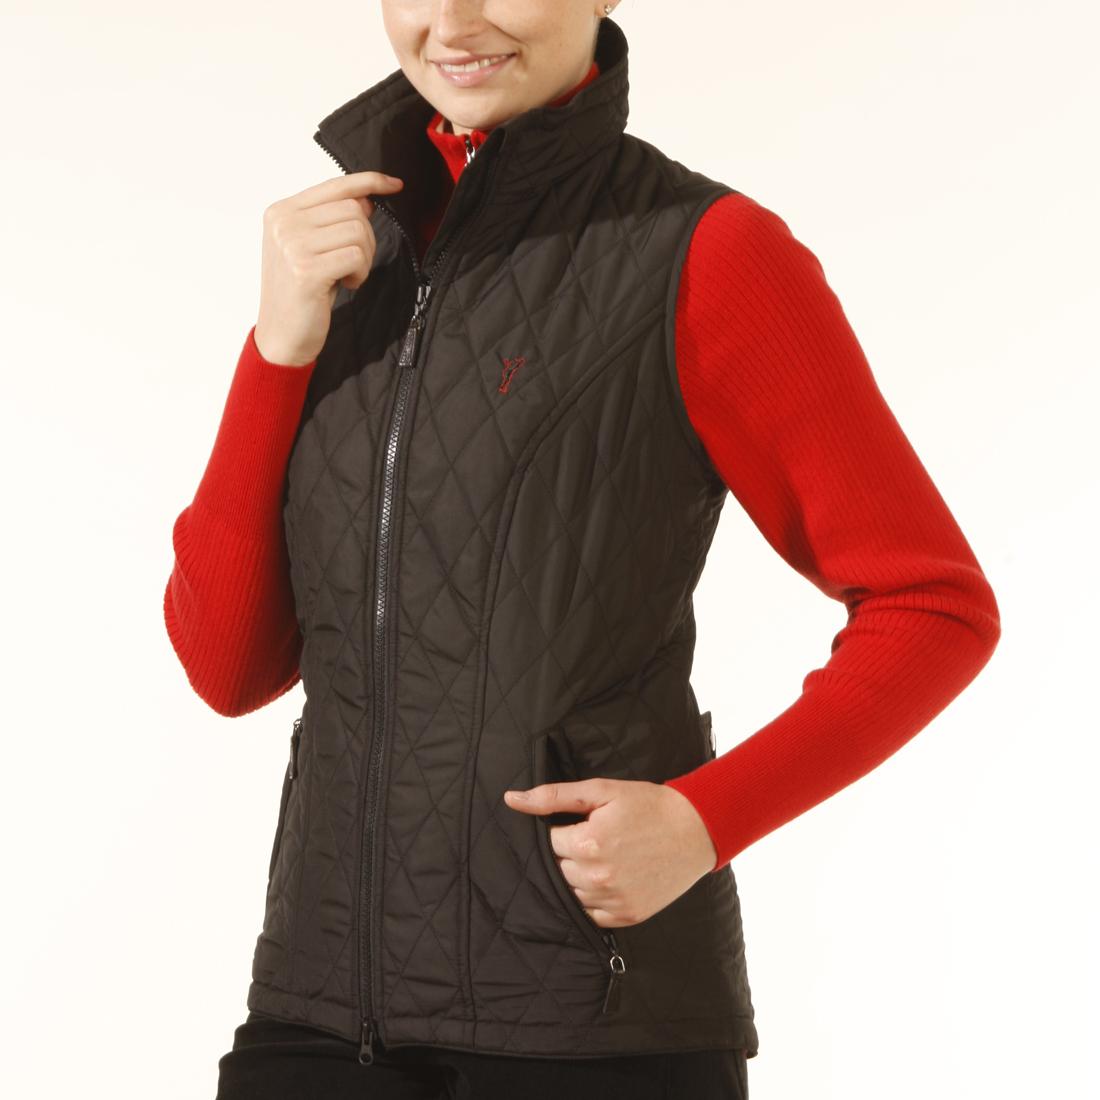 Microfibre waistcoat